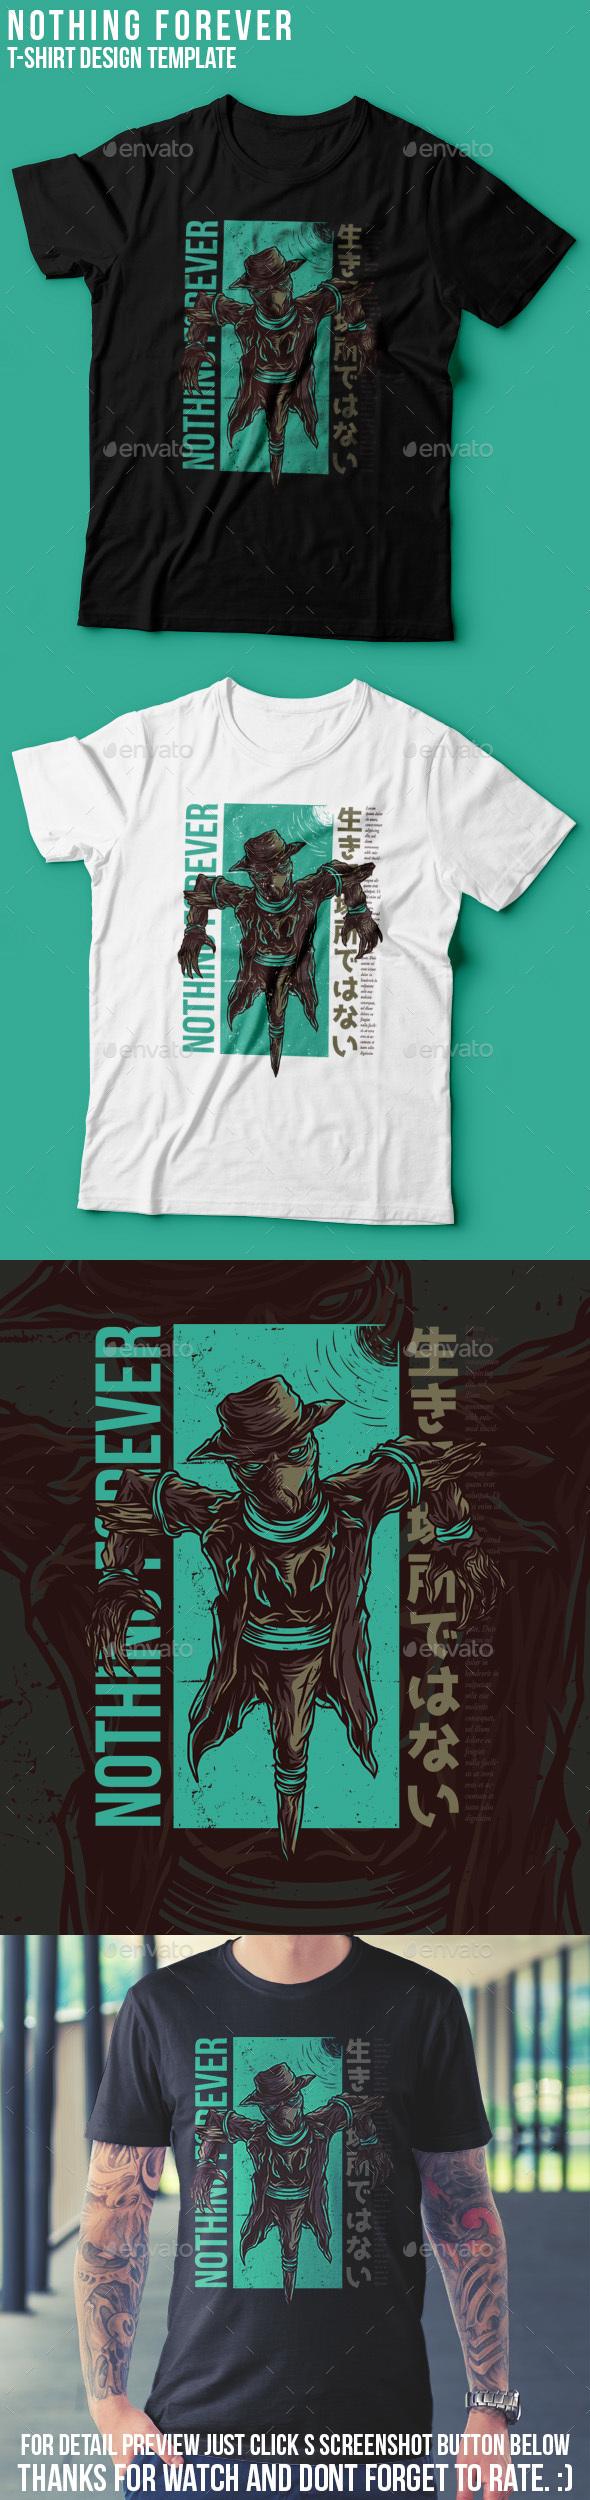 Nothing Forever T-Shirt Design